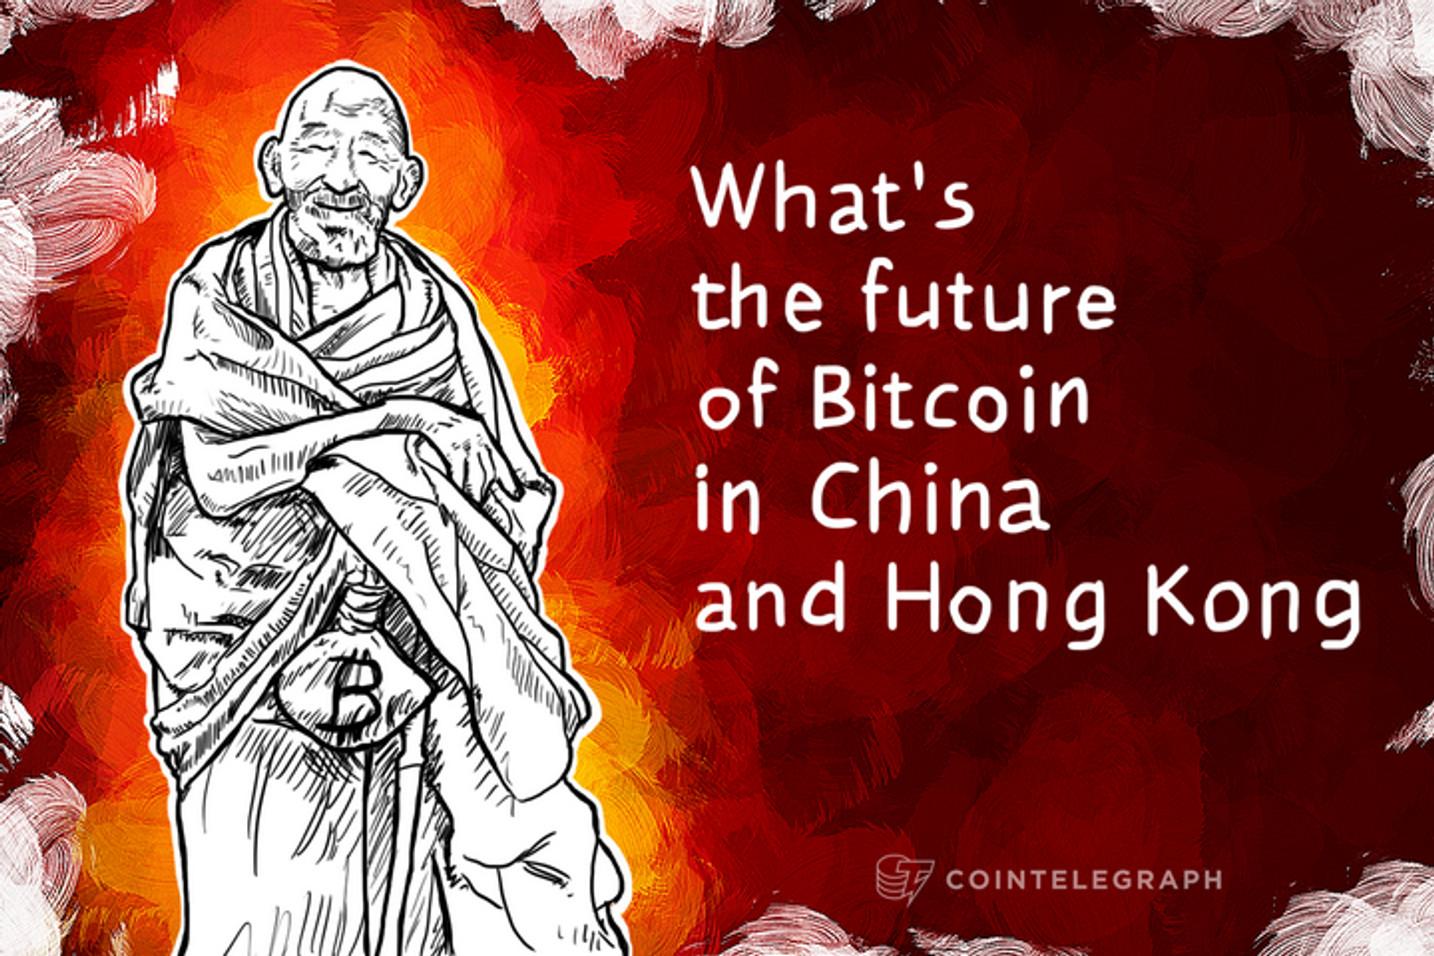 Cointelegraph asks: What's the future of Bitcoin in China and Hong Kong?